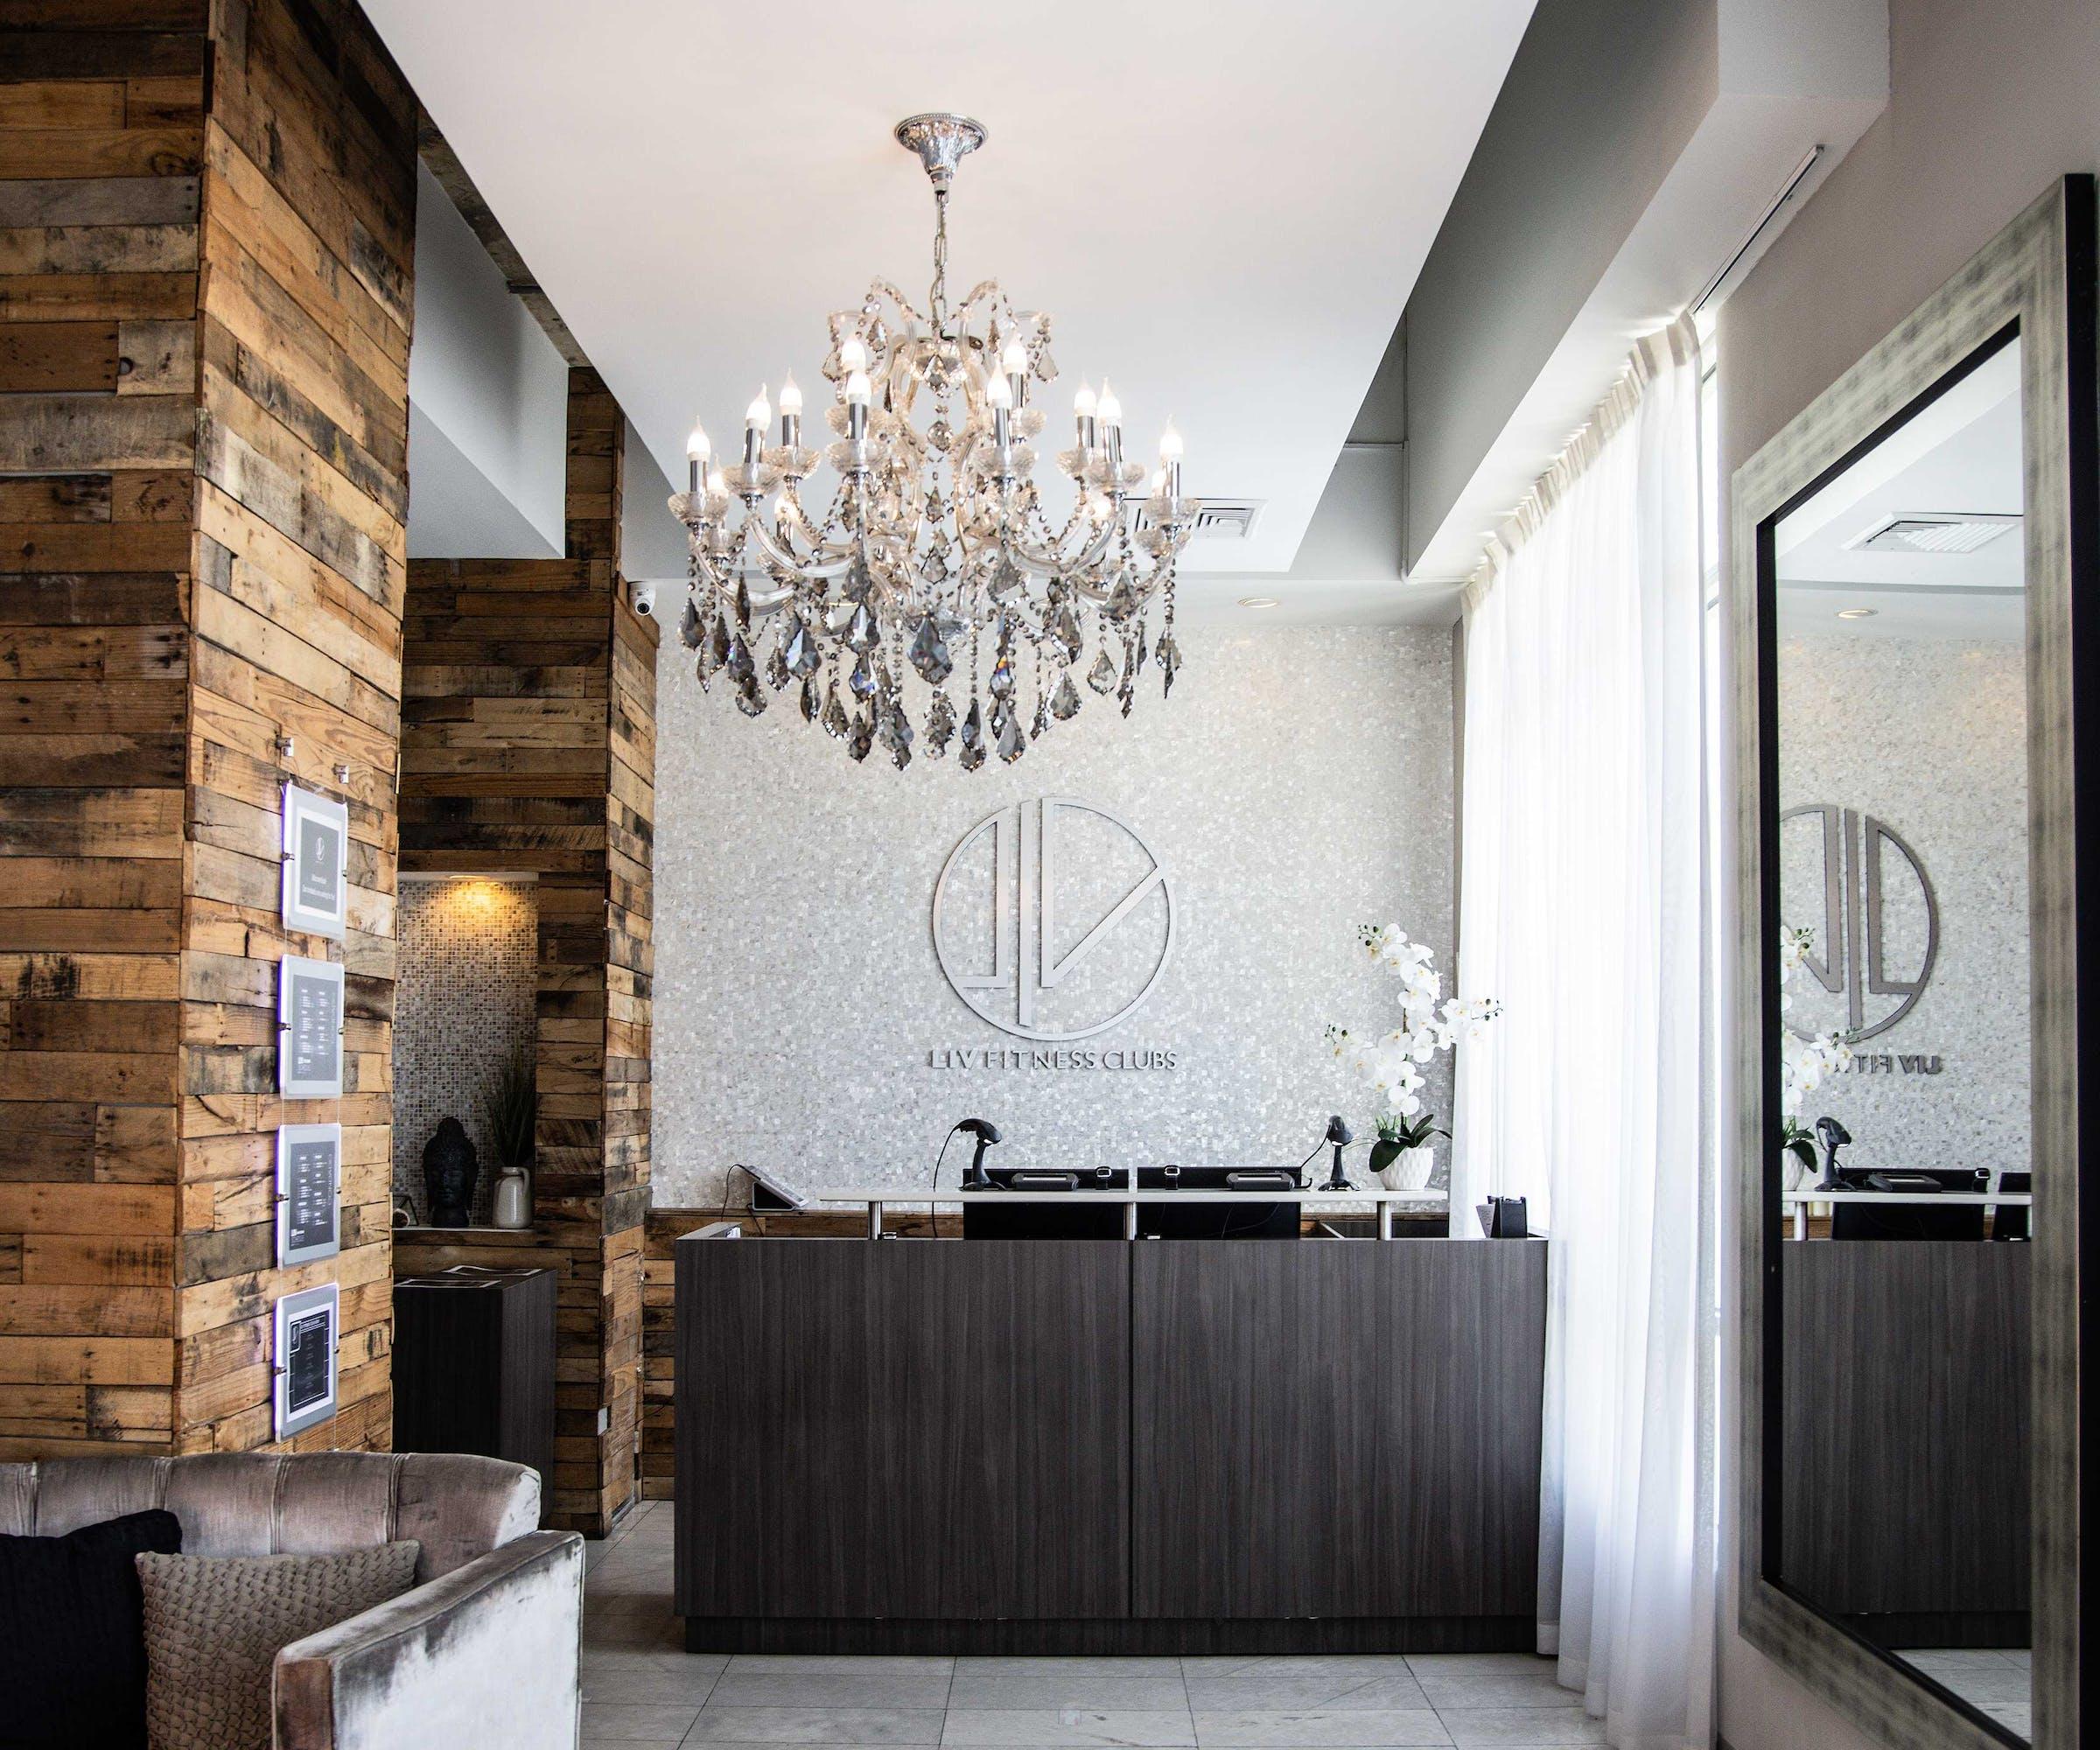 Luxury interior design of LIV Fitness Club in Condado